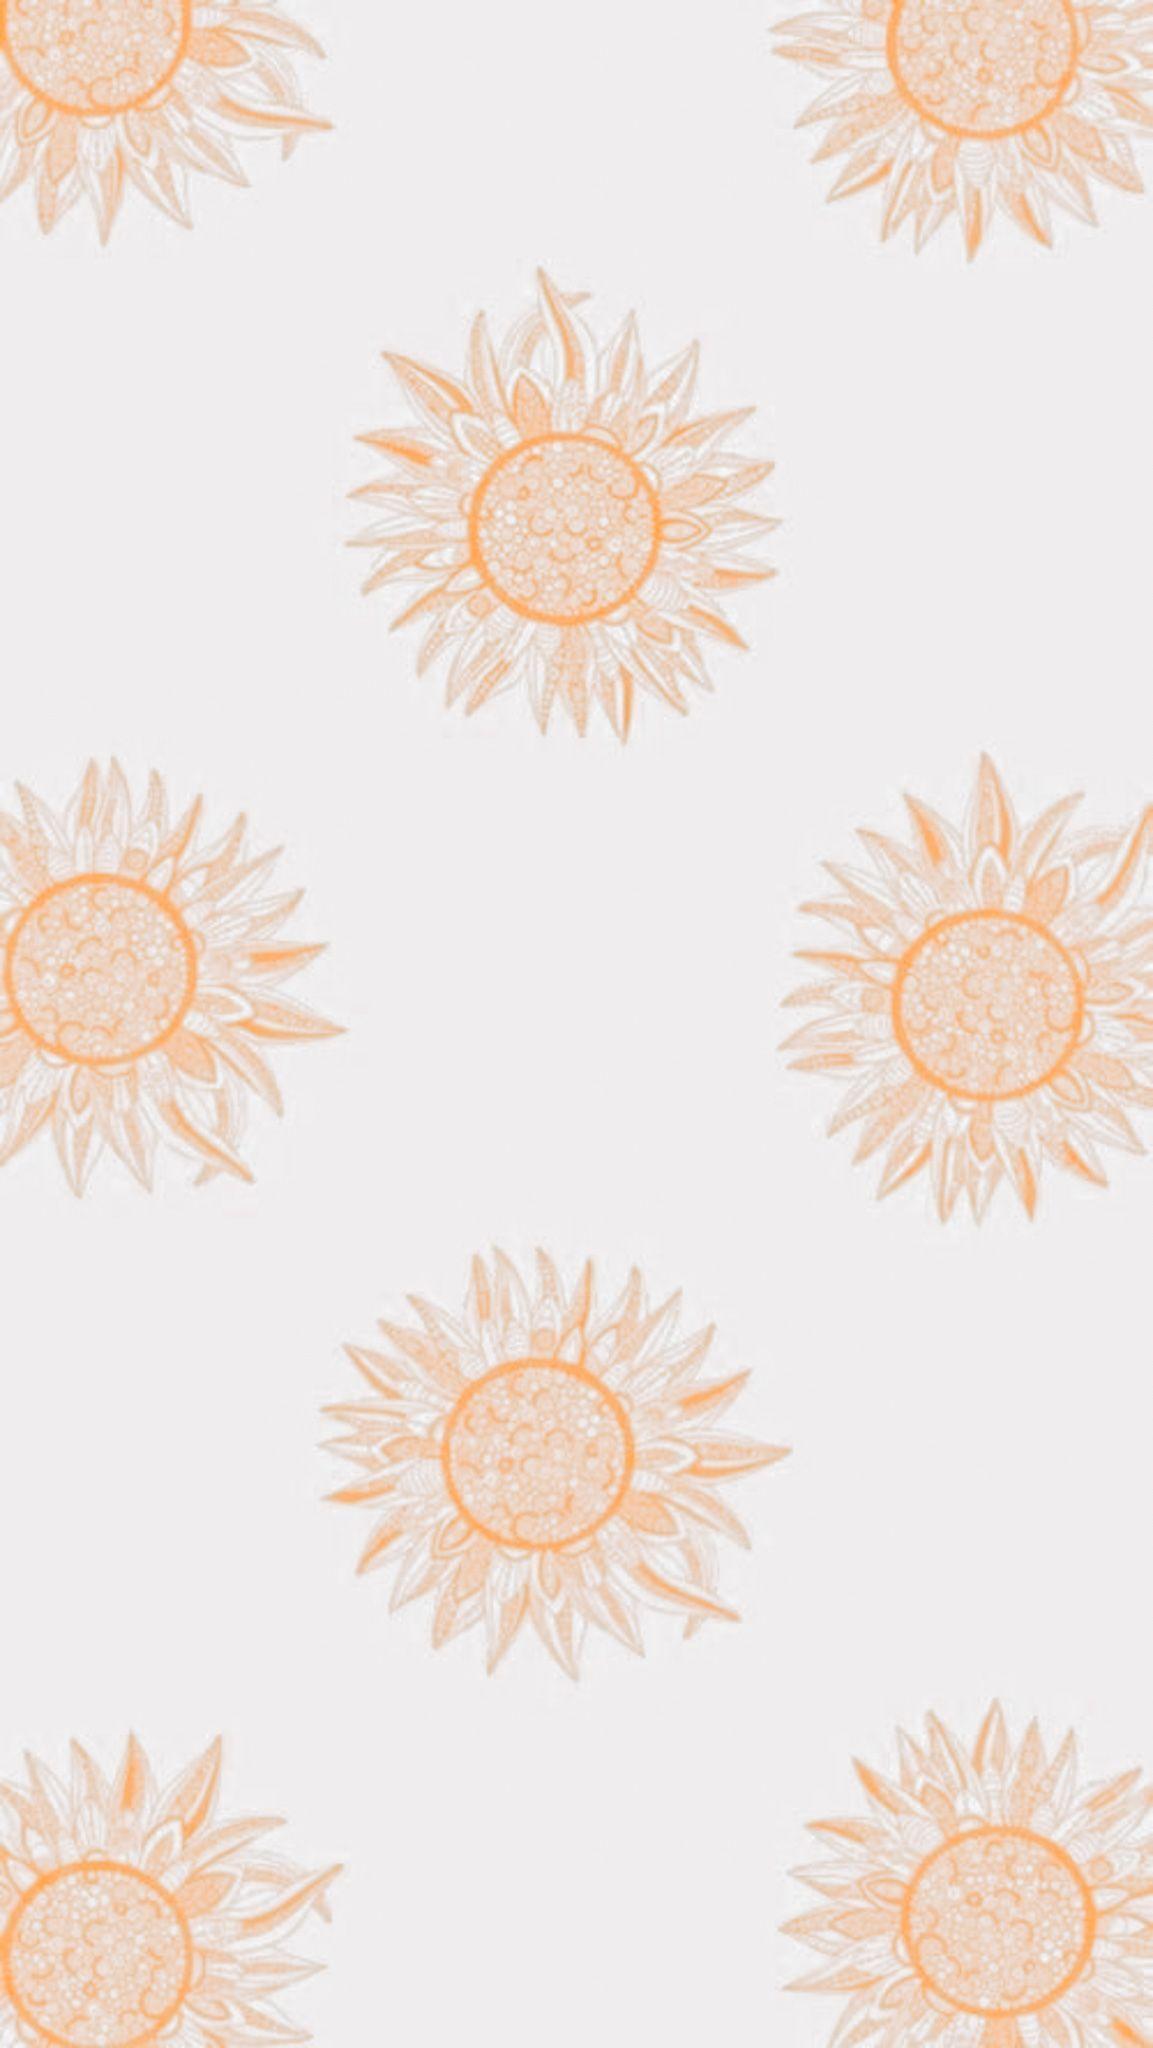 Boho Pastel Wallpapers Top Free Boho Pastel Backgrounds Wallpaperaccess